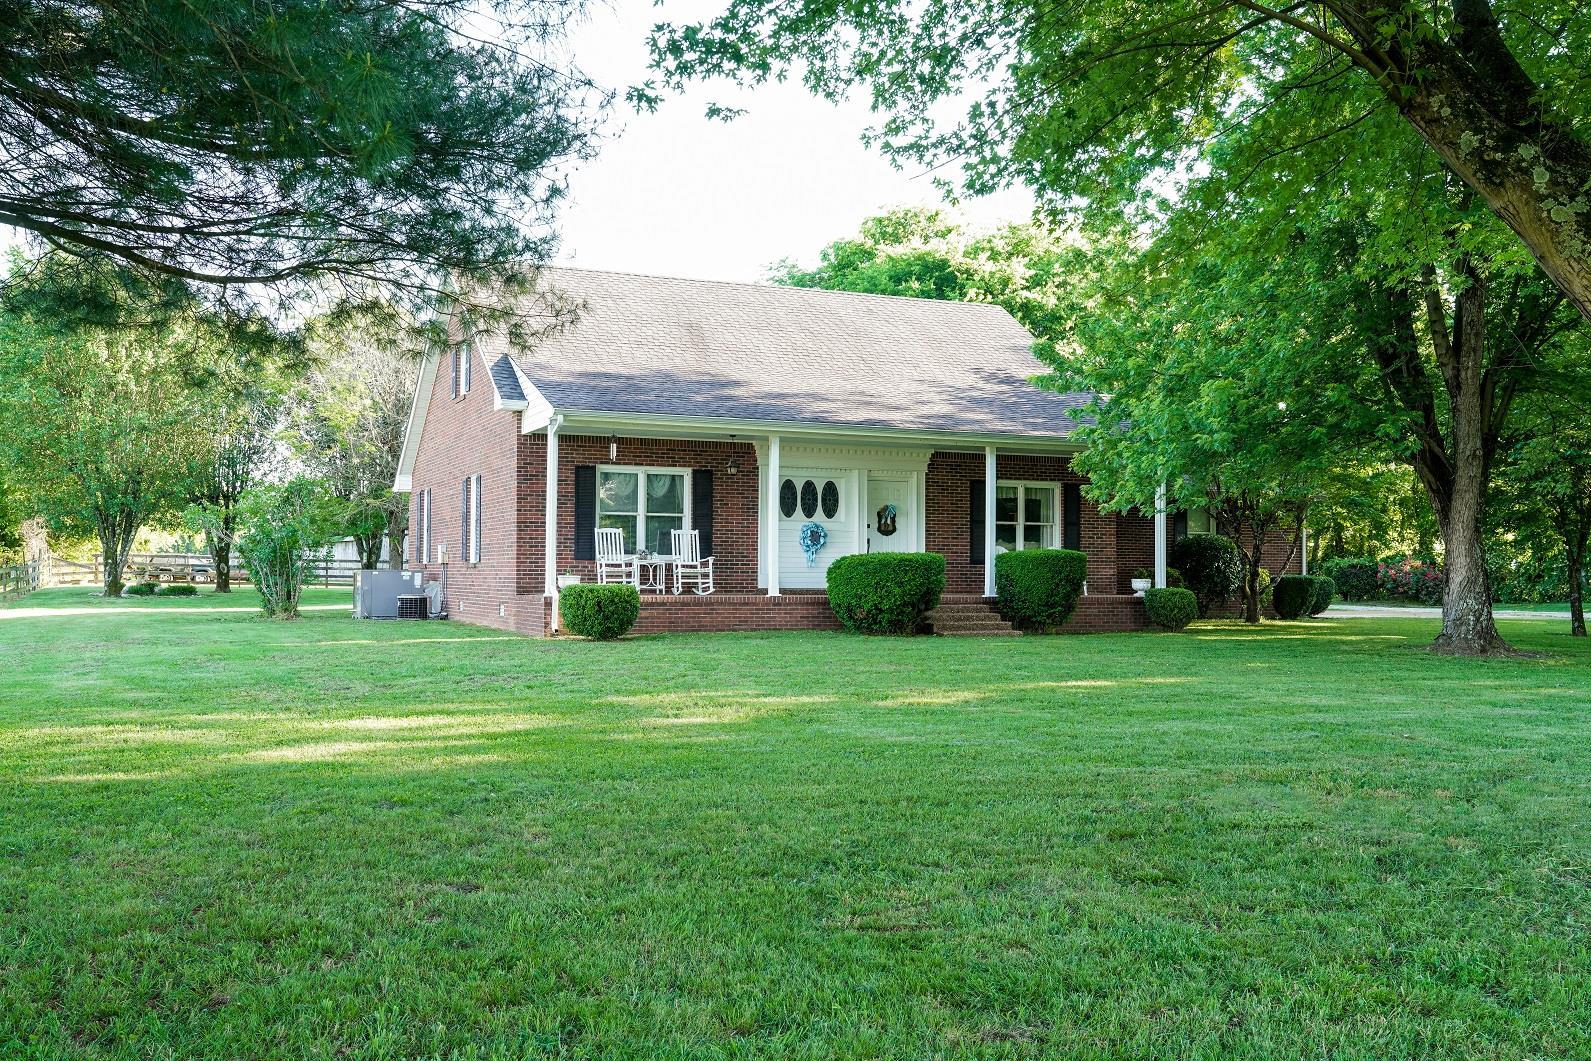 435 Cutoff Rd, Murfreesboro, TN 37129 - Murfreesboro, TN real estate listing